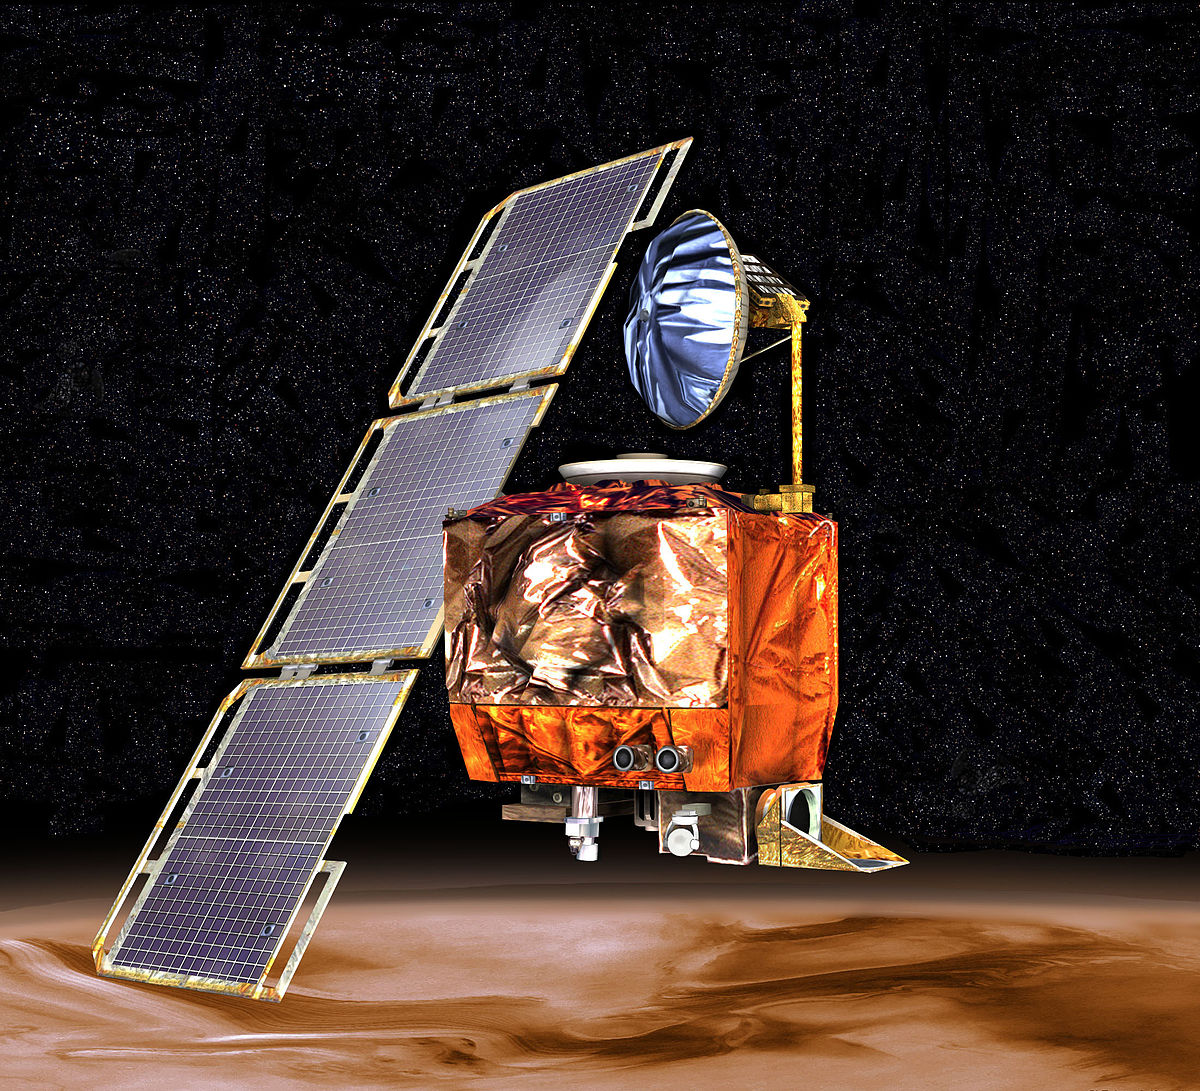 Mars Climate Orbiter - Wikipedia